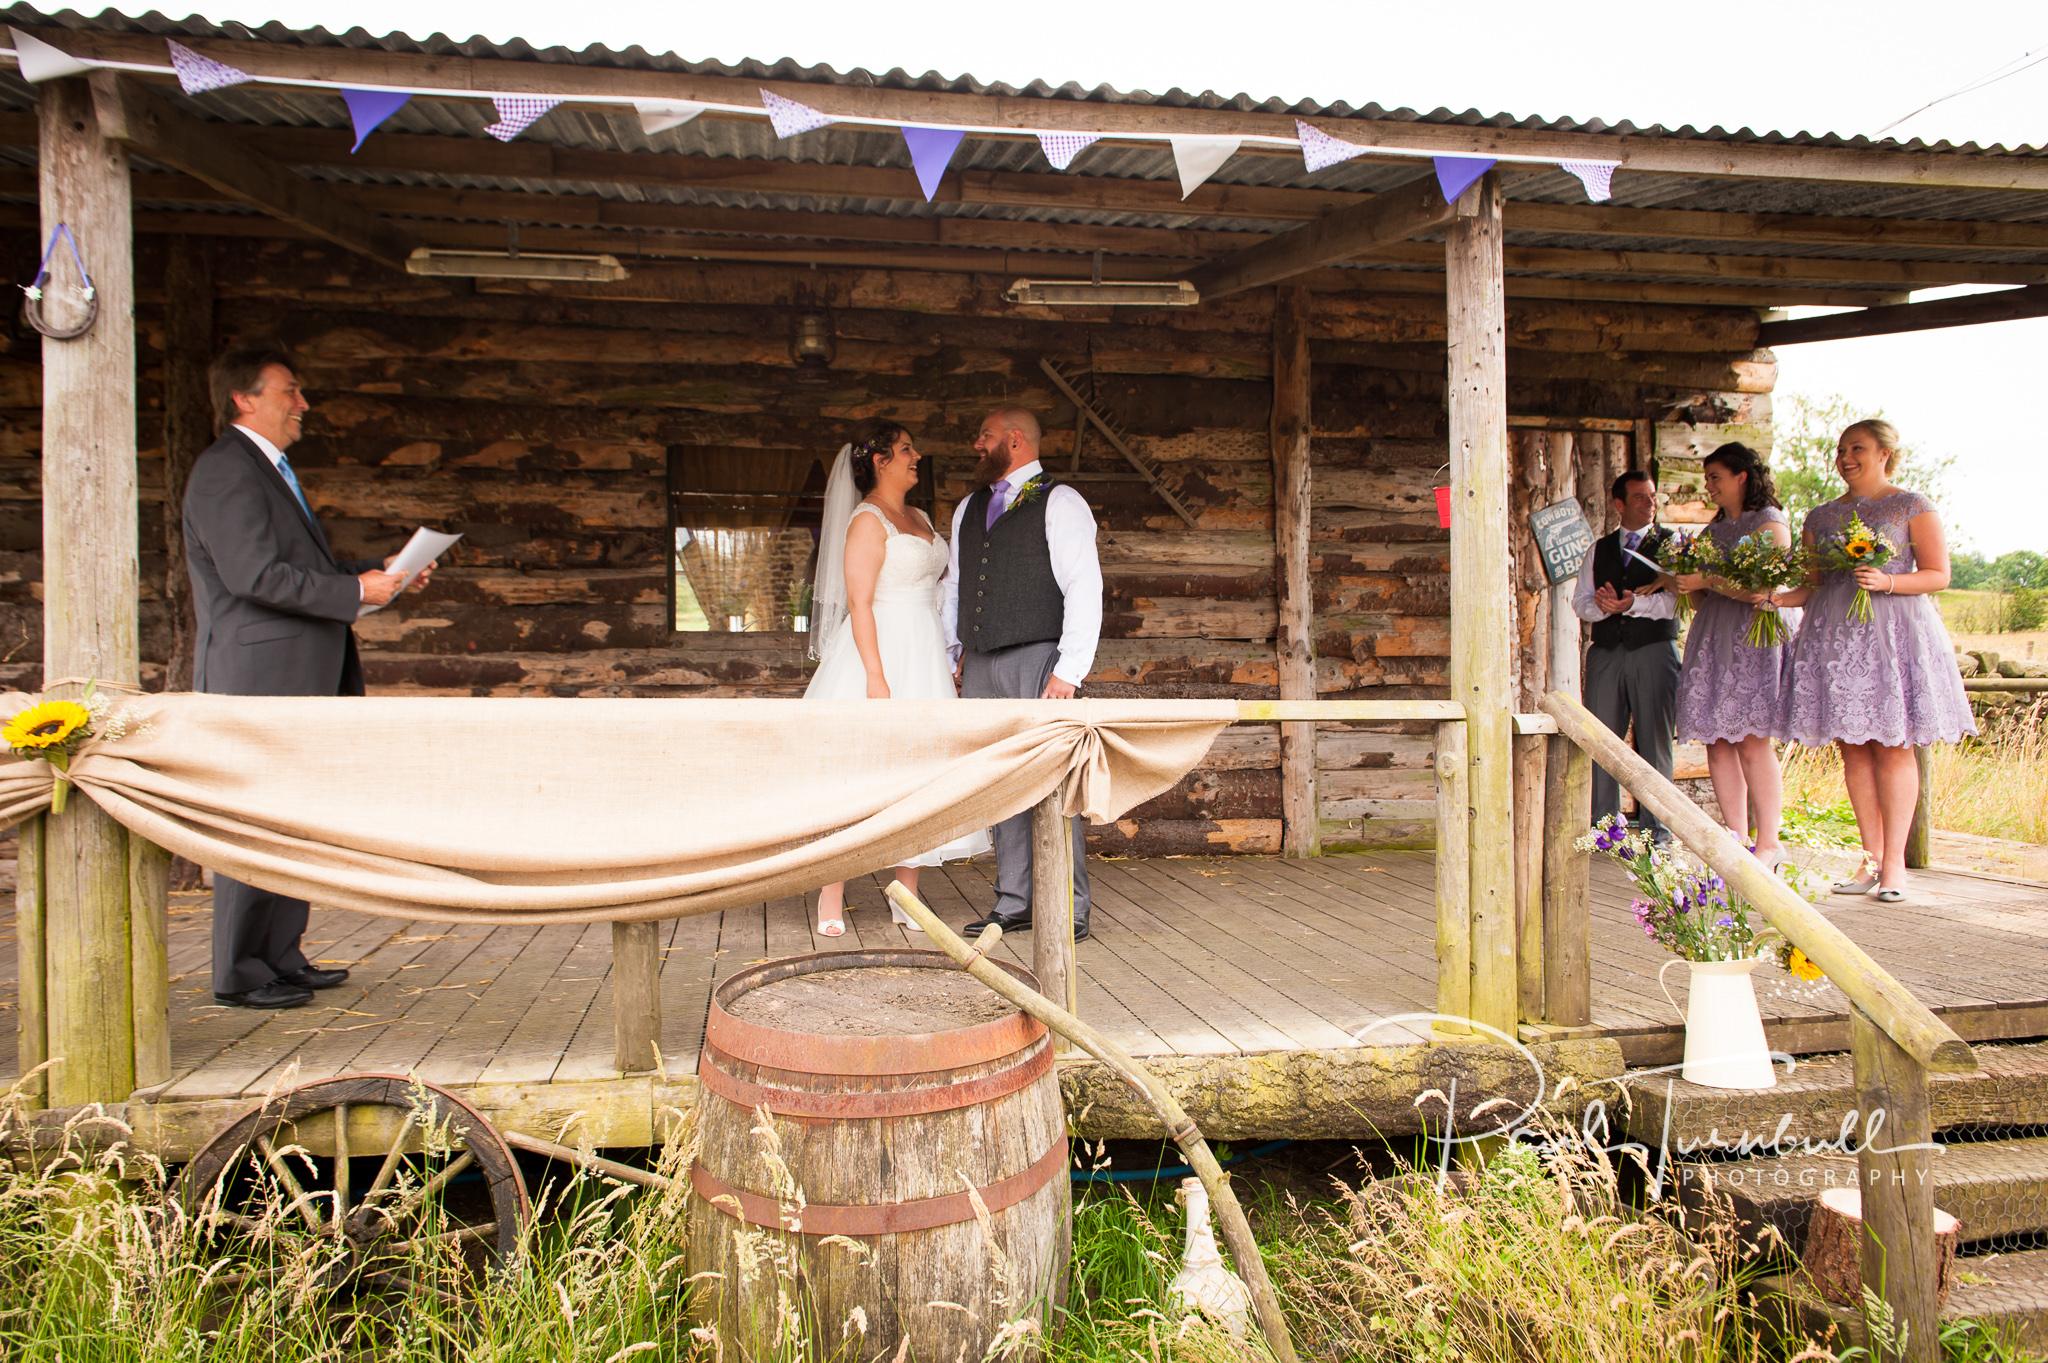 wedding-photographer-hilltop-farm-ilton-yorkshire-022.jpg